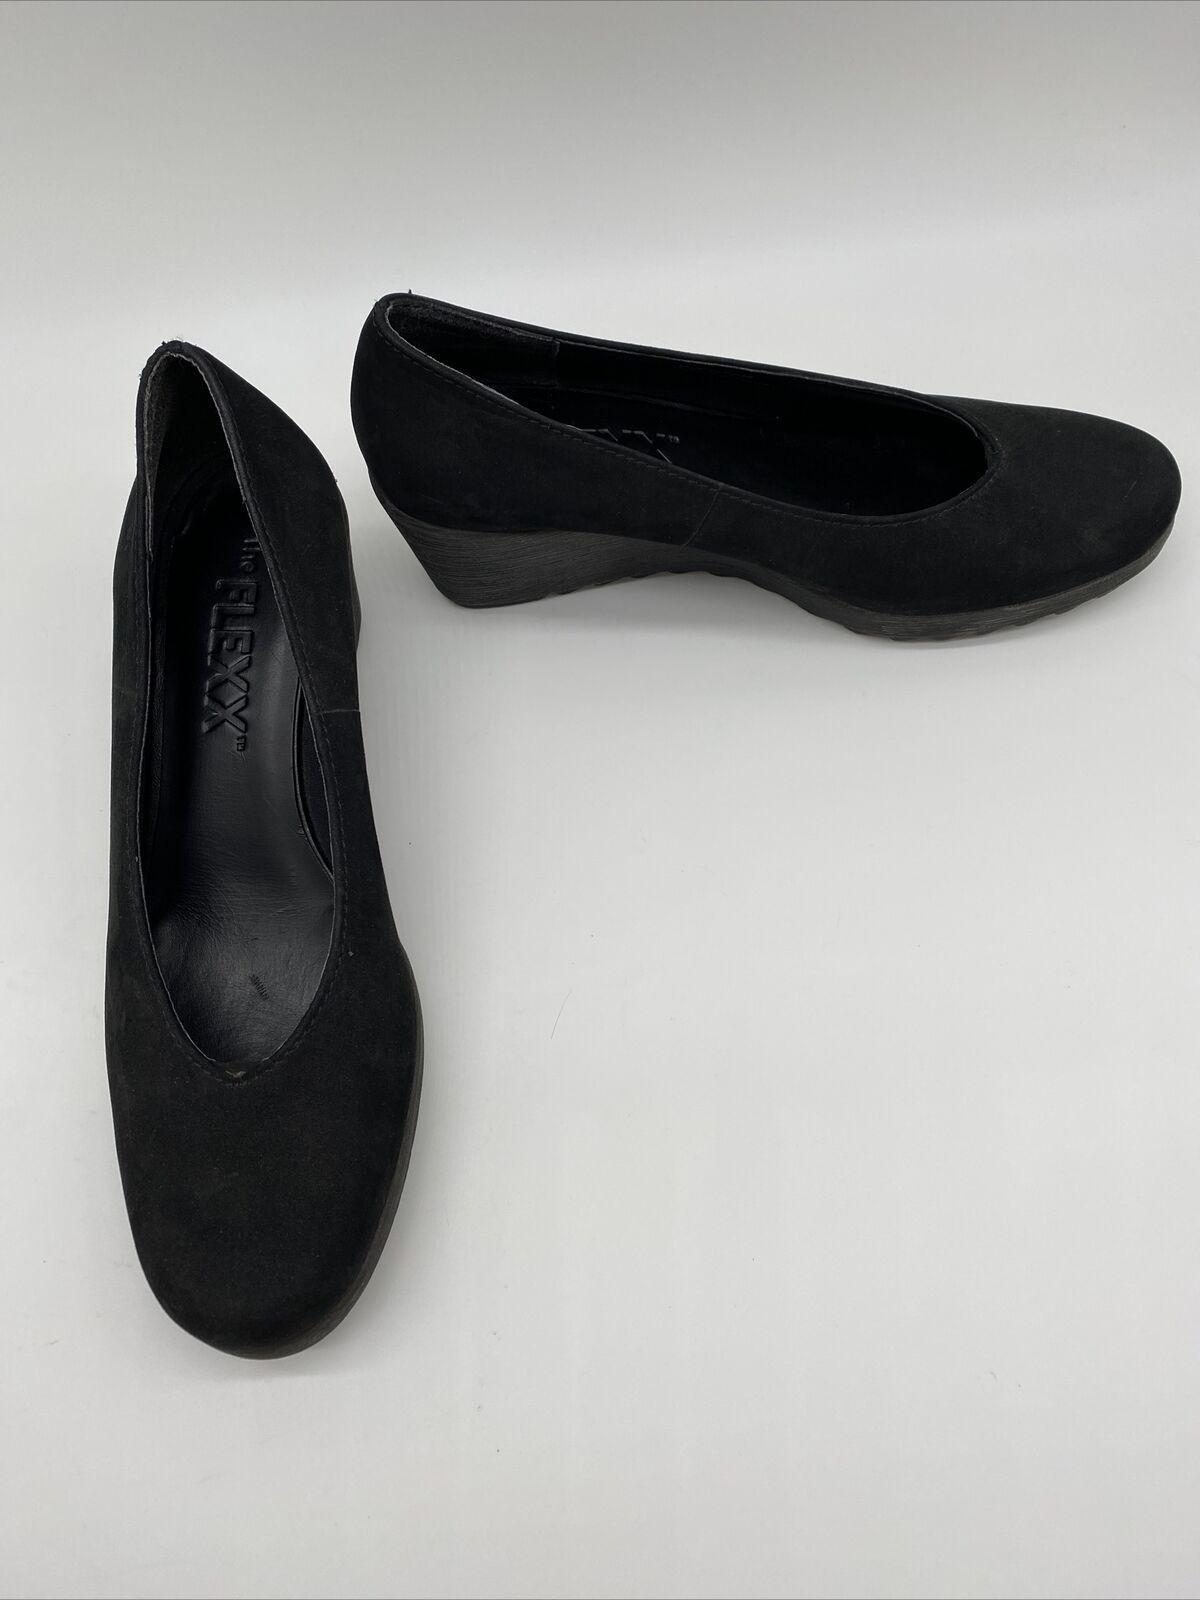 The FLEXX Womens Comfort Shoes Black Faux Suede Wedge Heel EUR 39 US 8 M